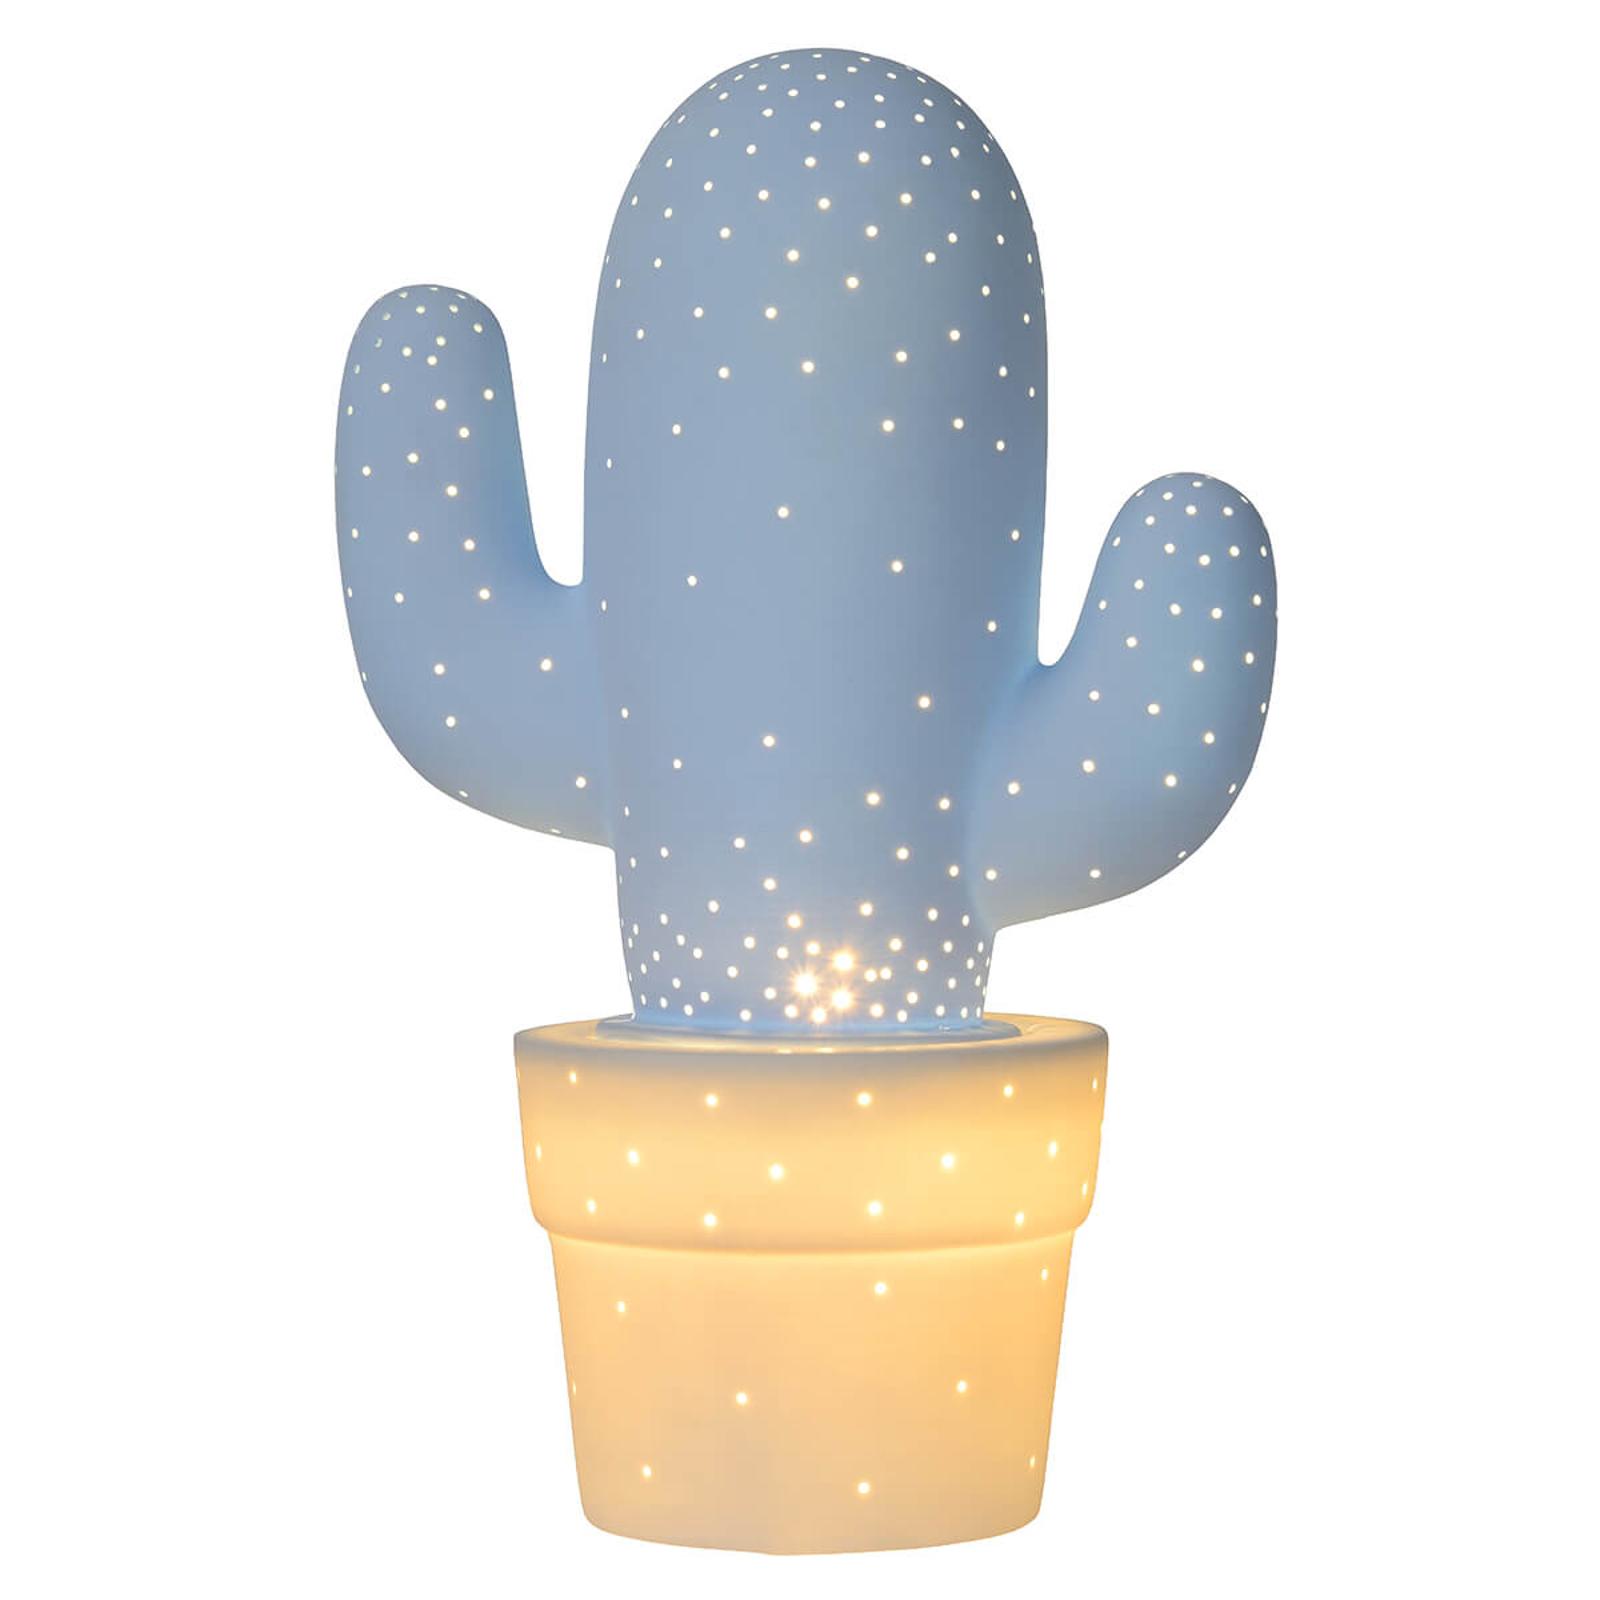 Decoratieve tafellamp Cactus van keramiek, blauw